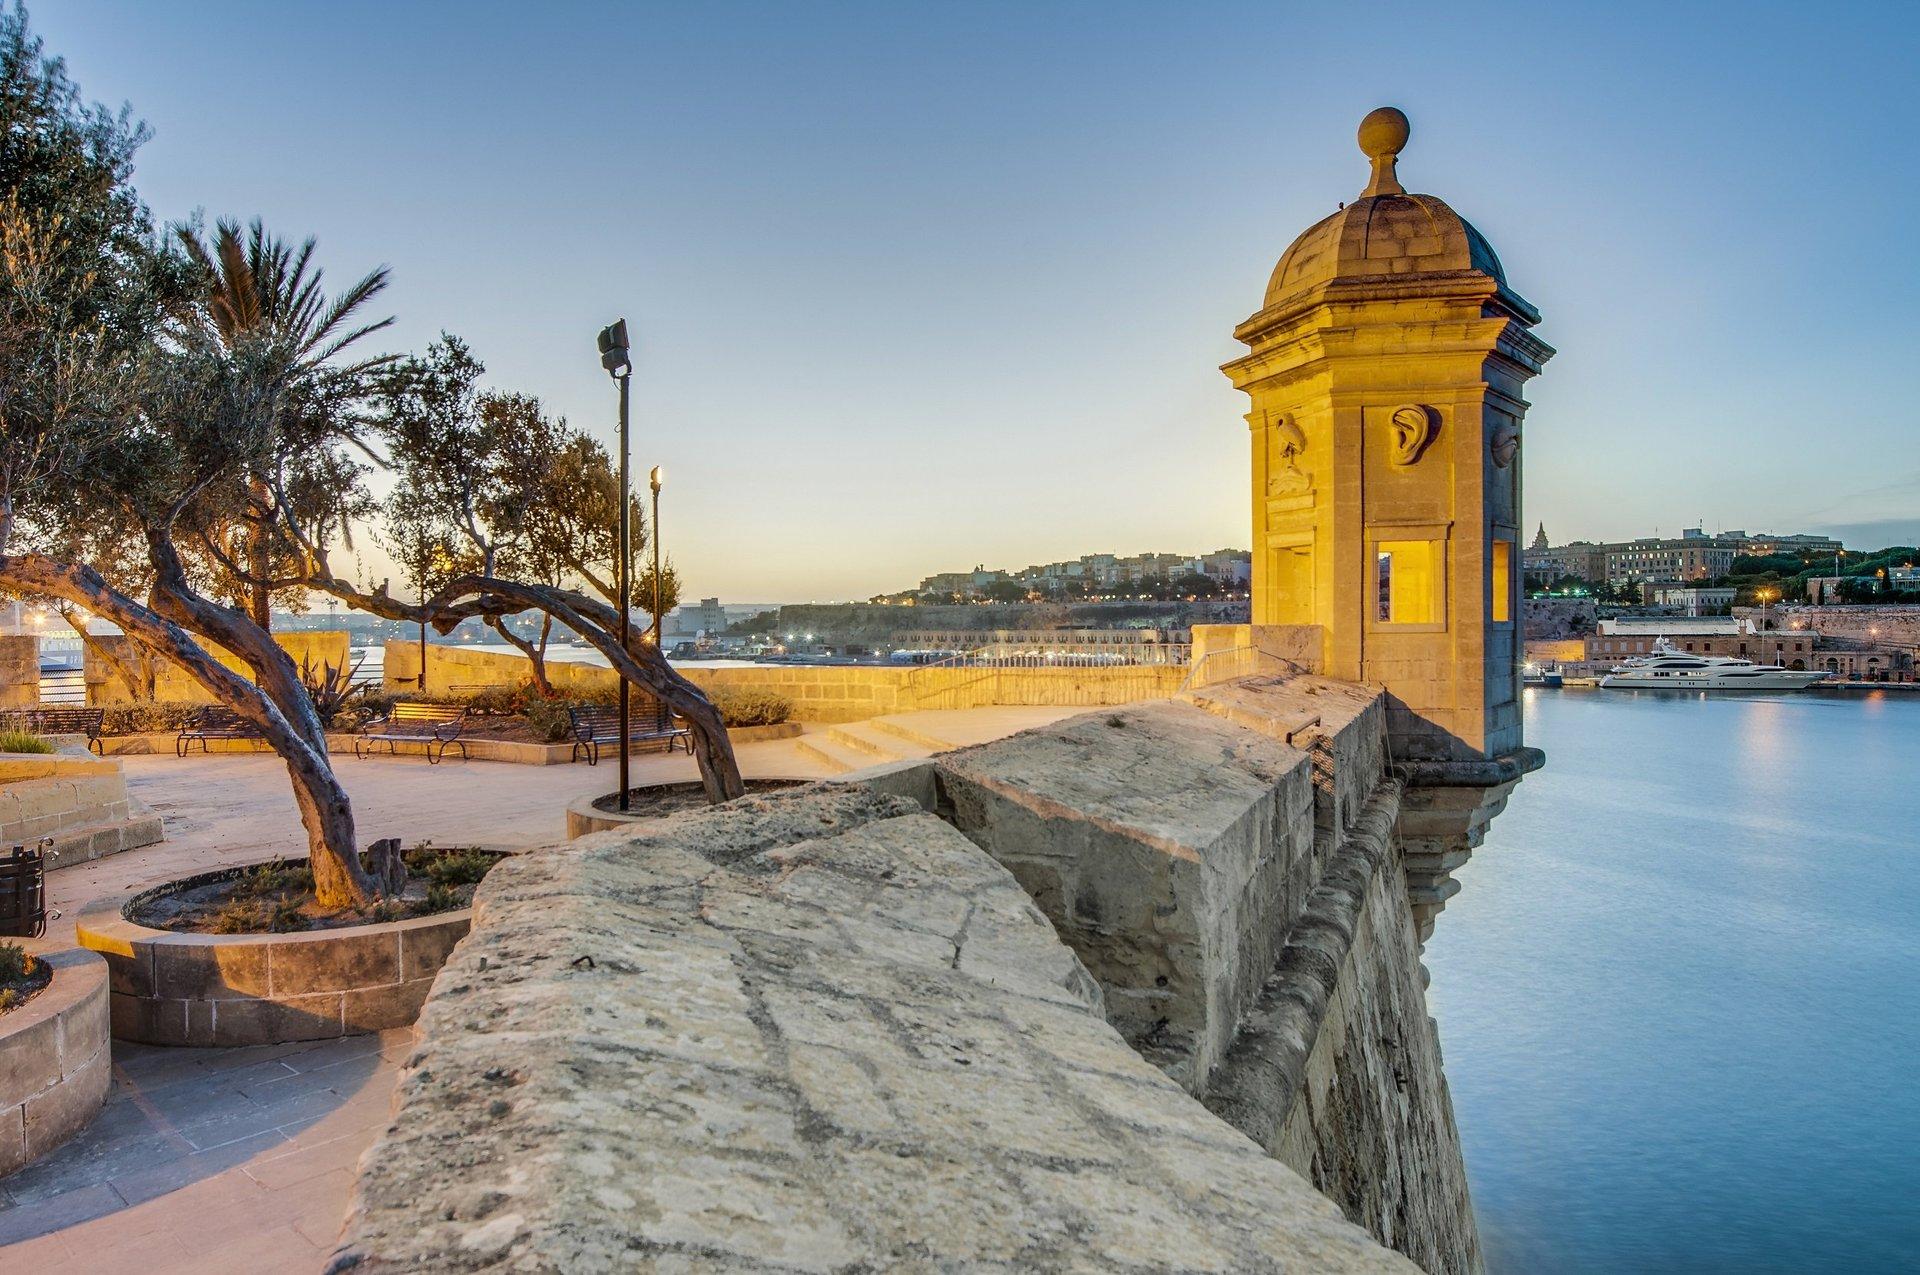 Wachttoren Fort Saint Michael in Senglea - Malta